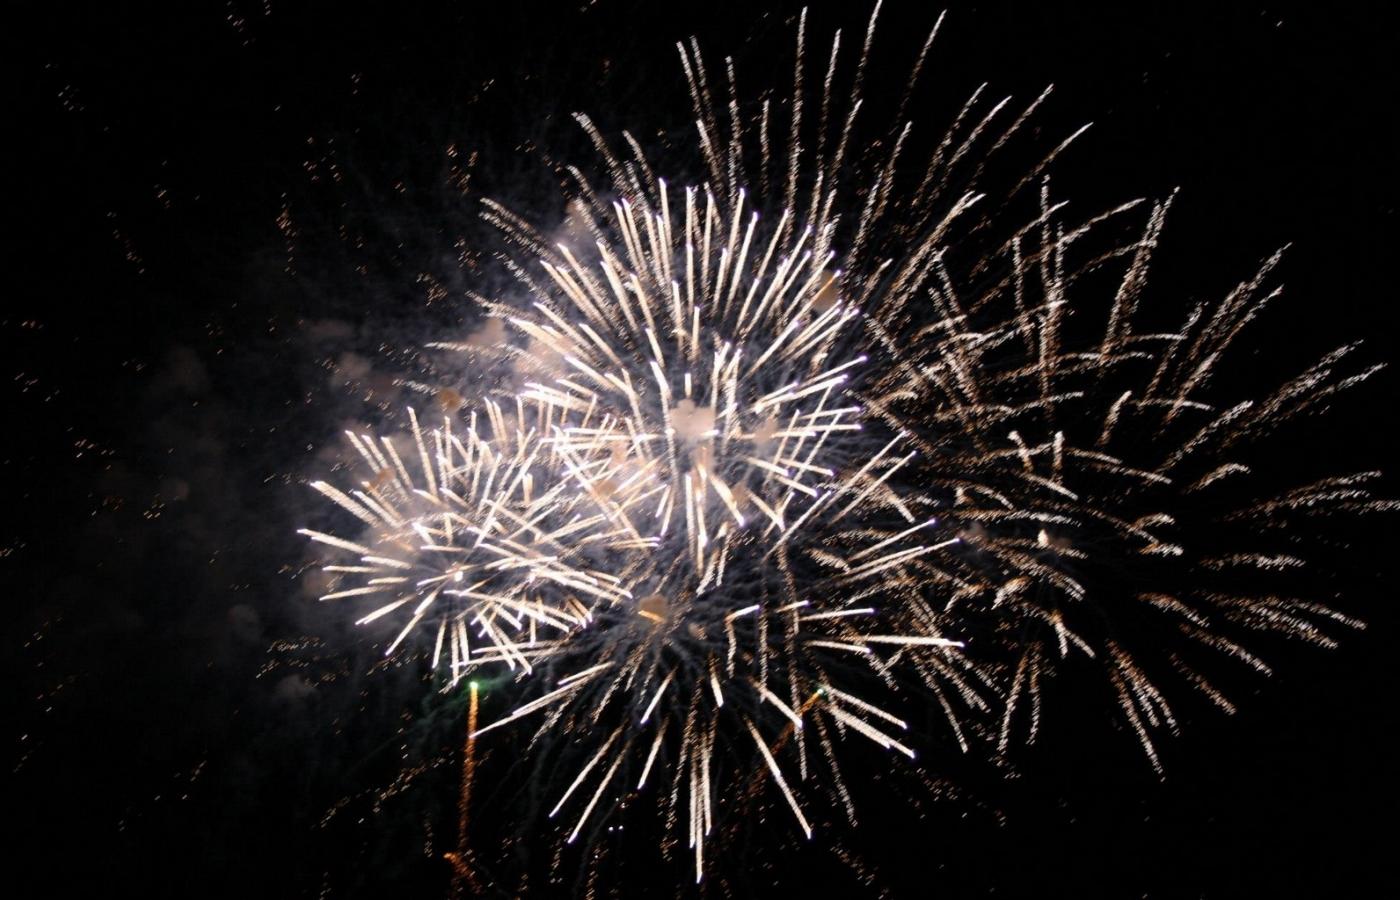 artificii la mare inaltime 03